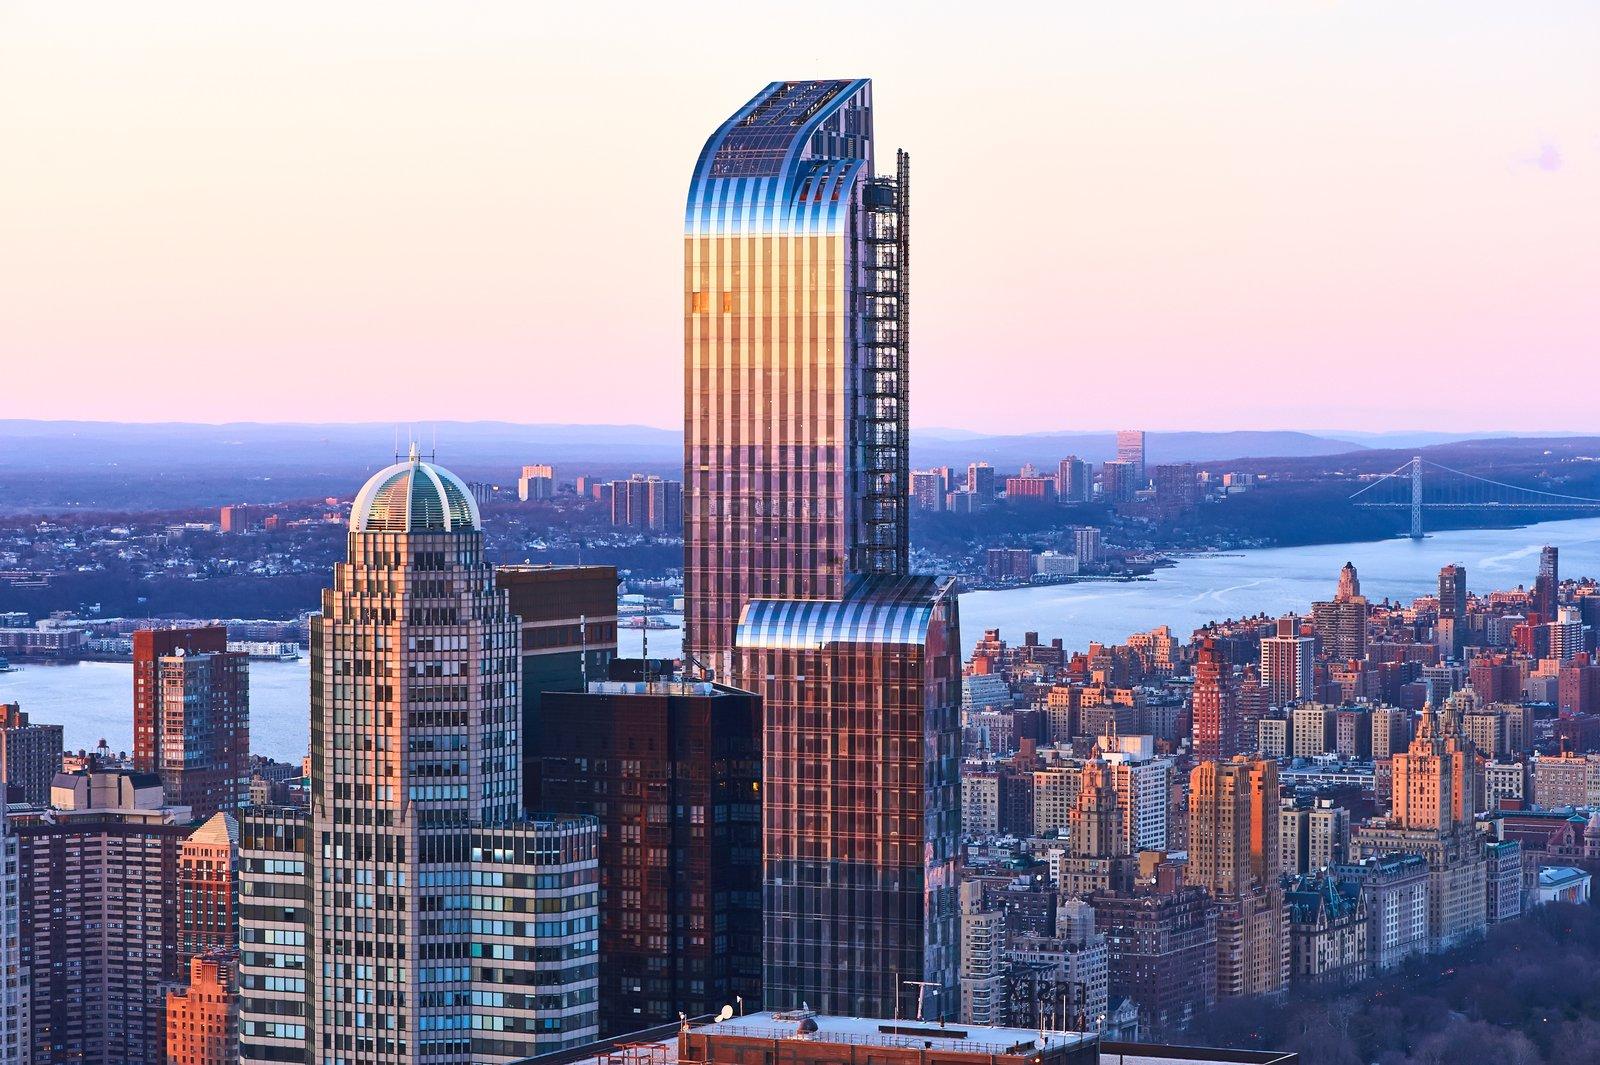 Chinatown Manhattan, NY Private Investigator